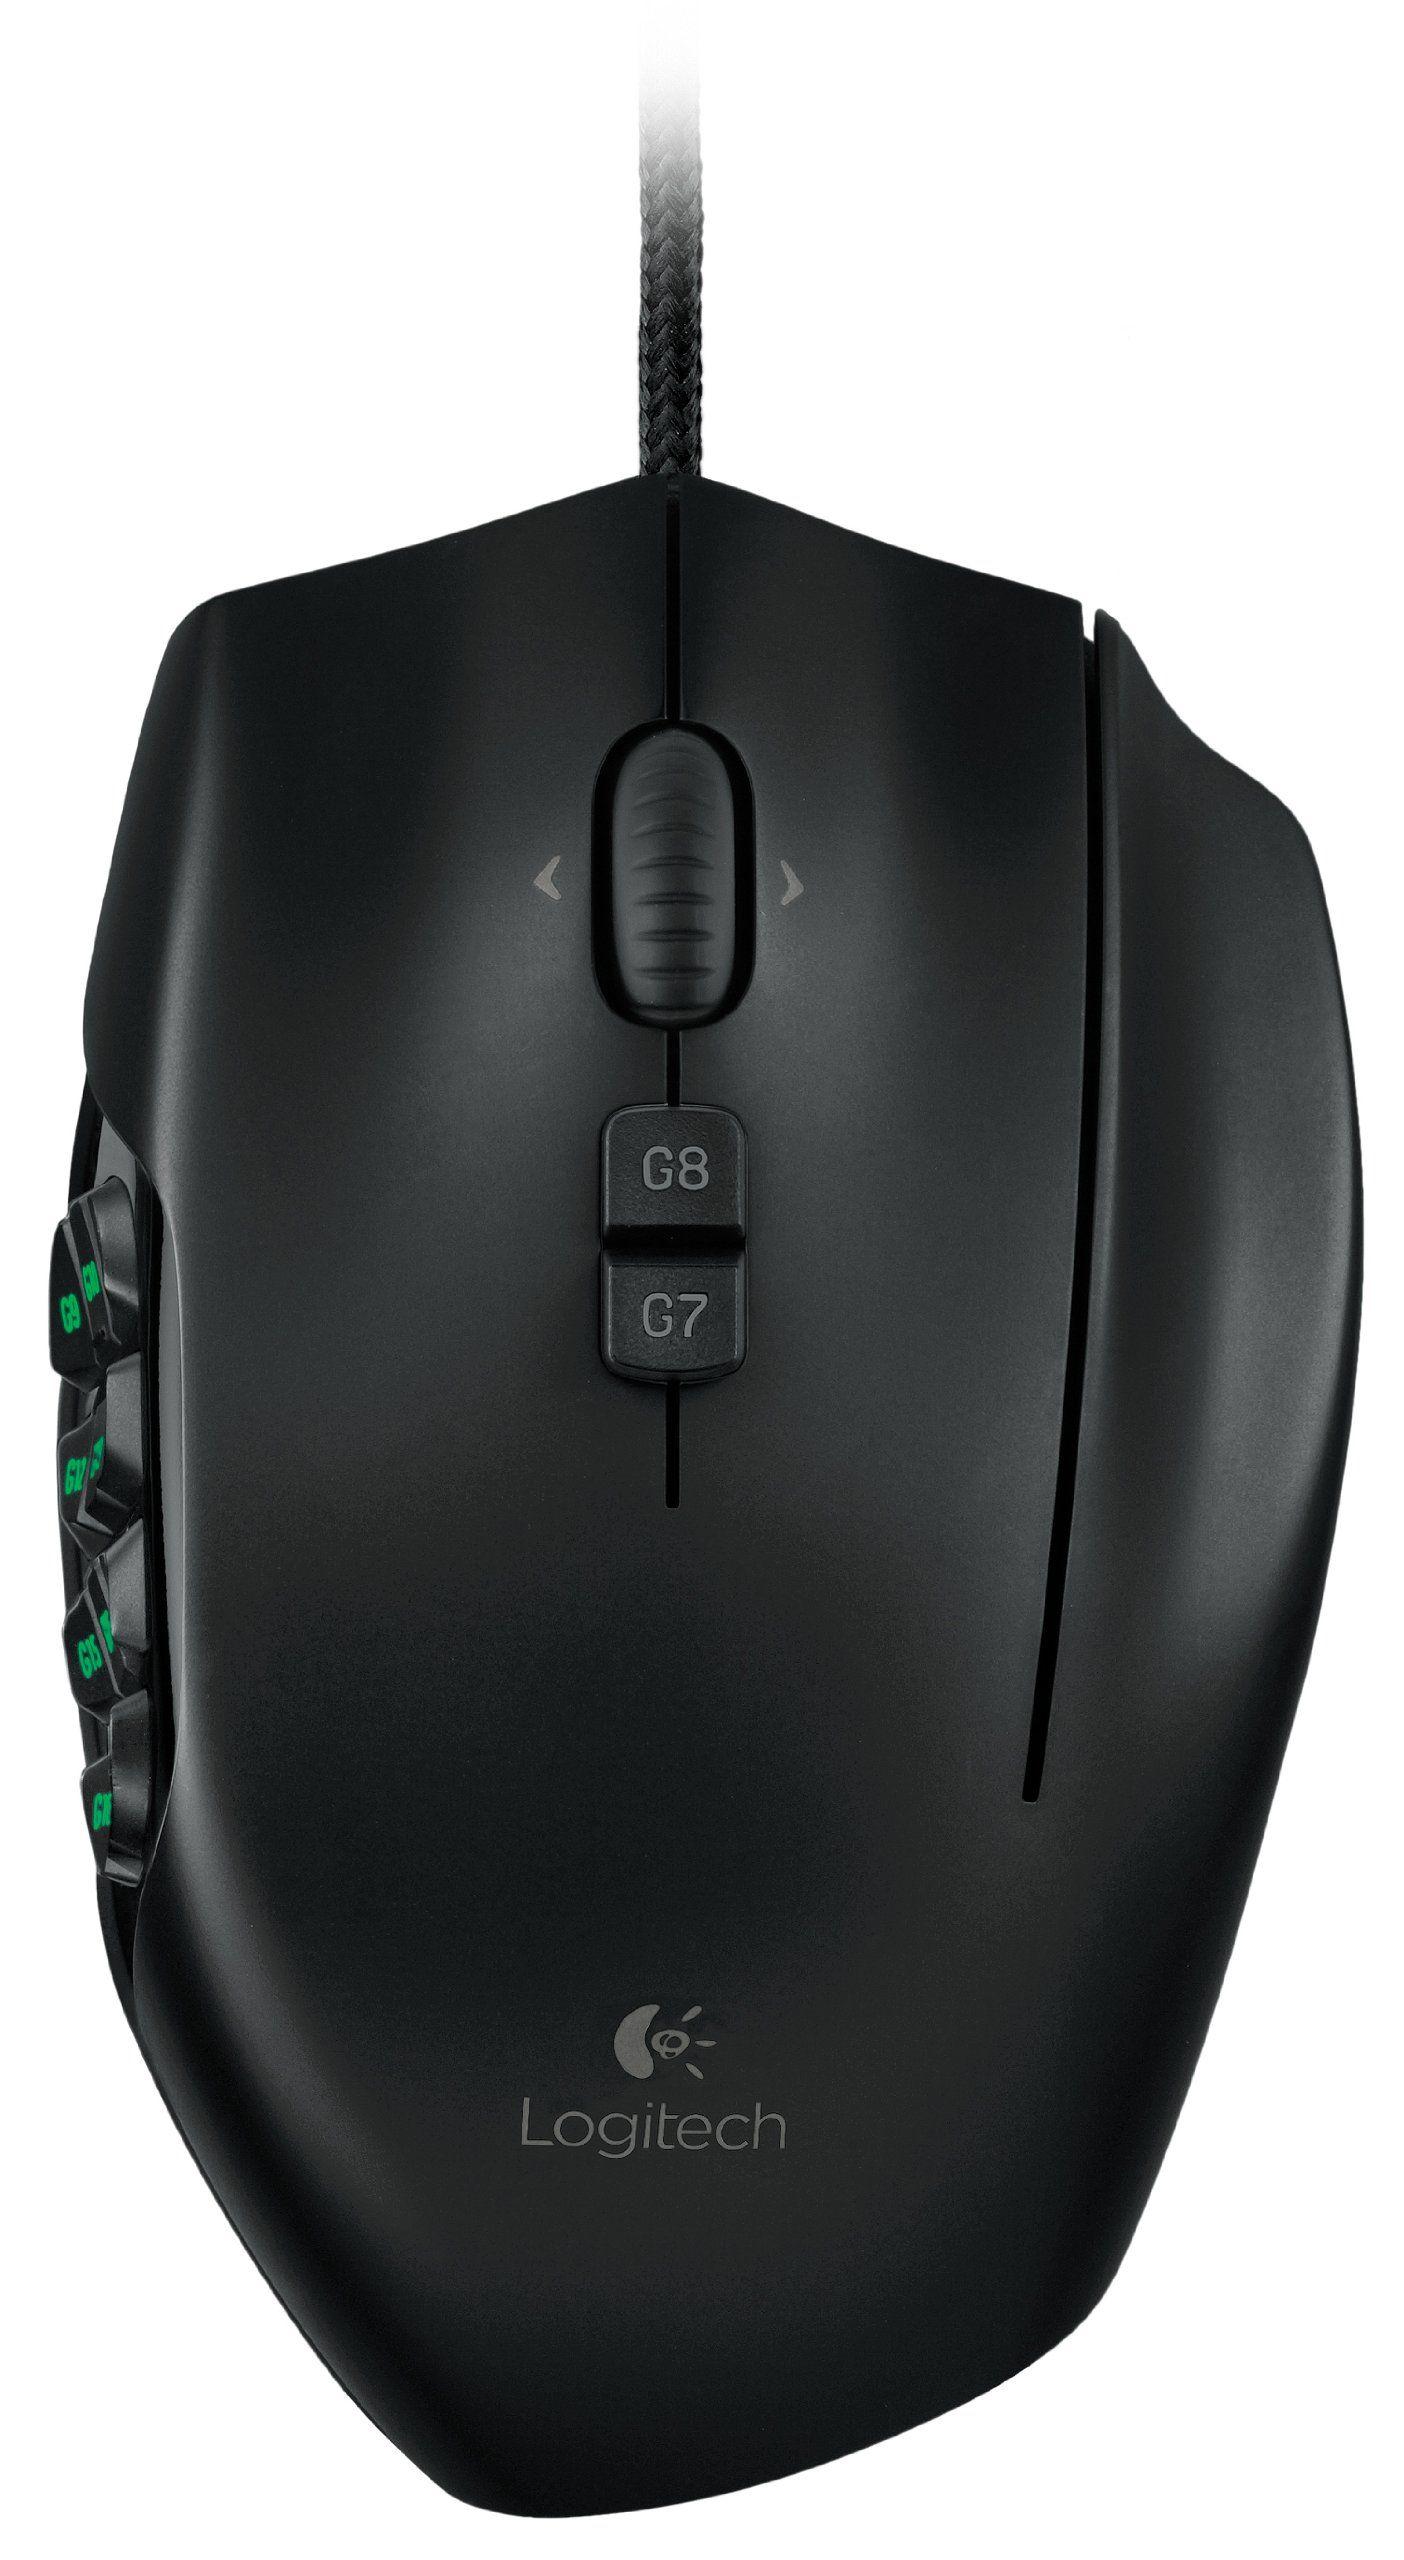 20ee72c9352 Logitech G600 MMO Gaming Mouse, RGB Backlit, 20 Programmable Buttons,#Gaming,  #Mouse, #MMO, #Logitech